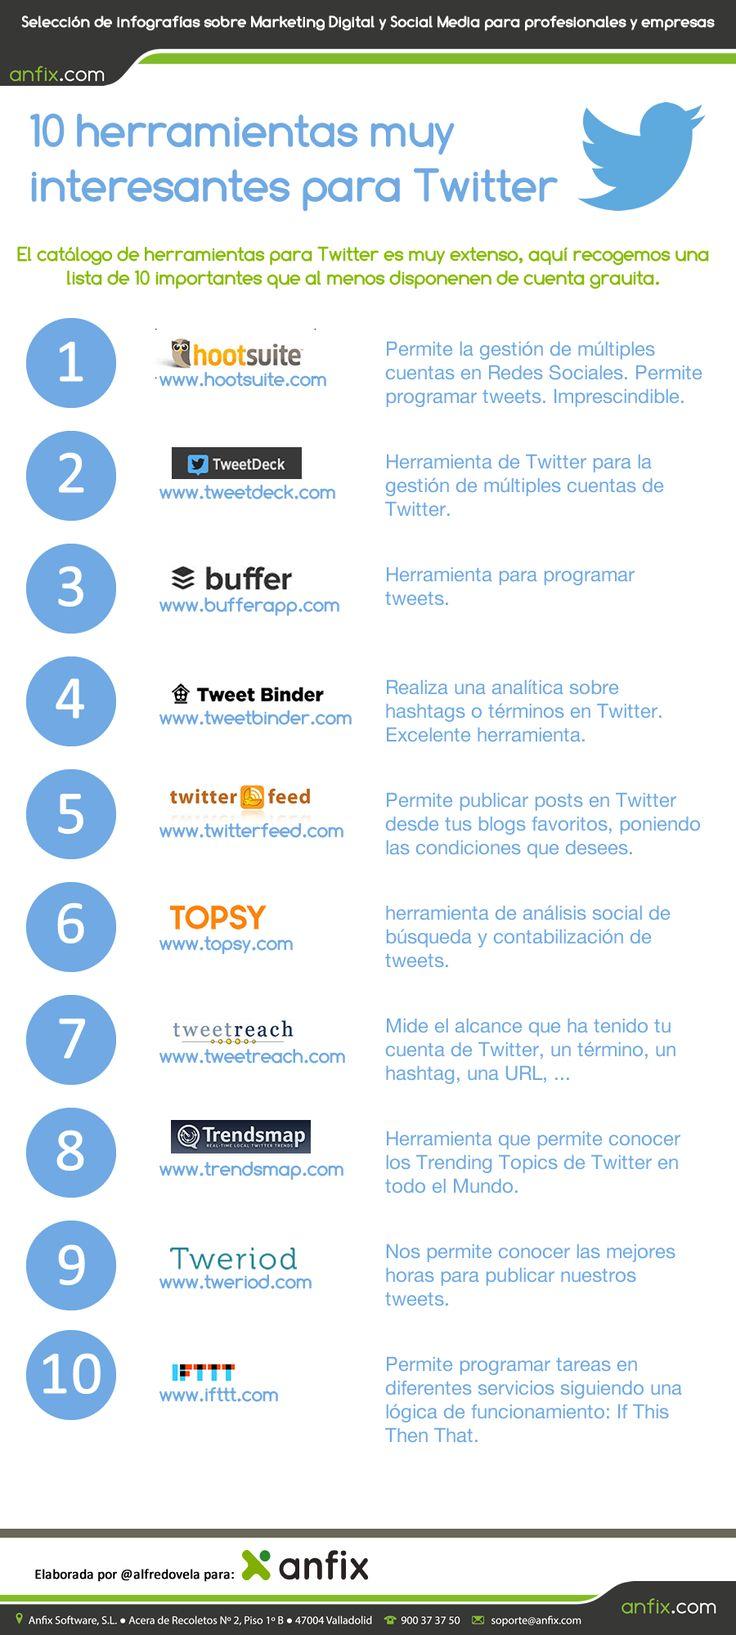 10 herramientas muy interesantes para #Twitter #infografia #infographic #socialmedia